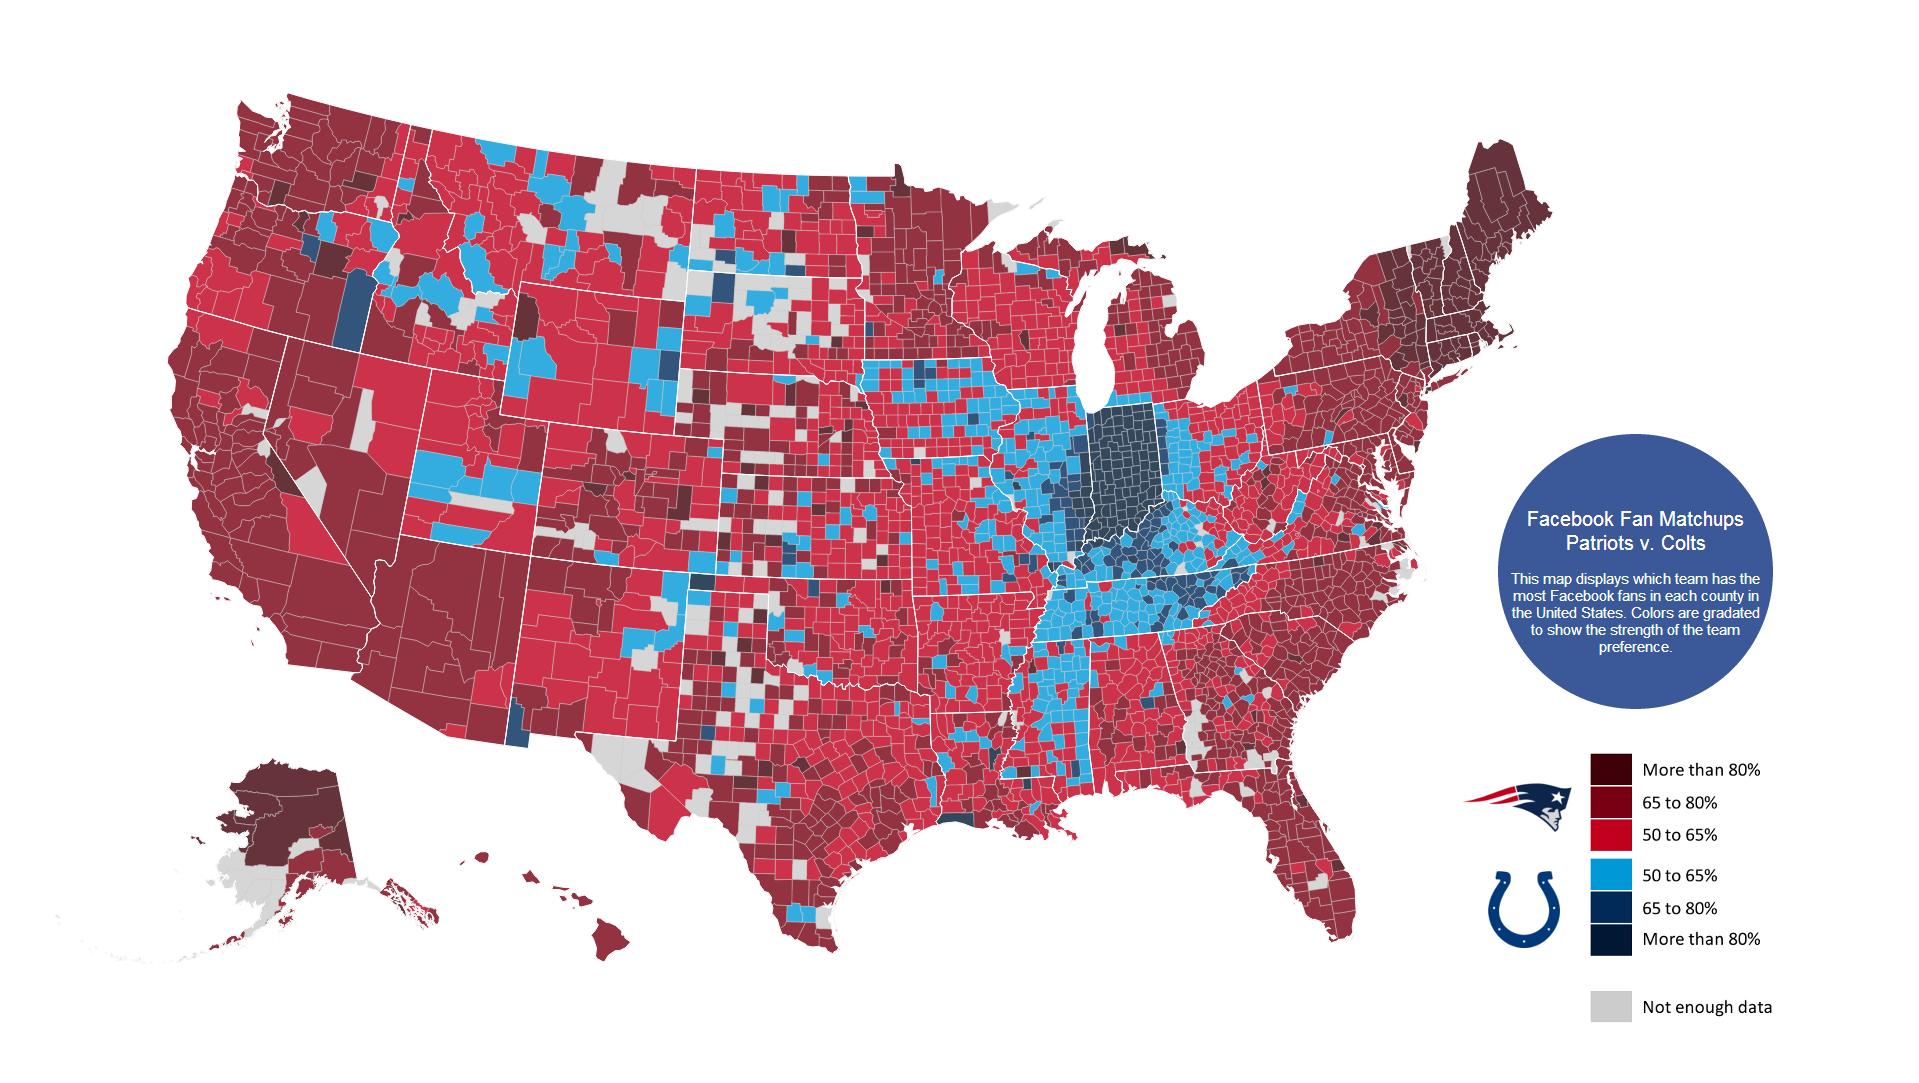 Facebook Fandom Maps For Nfl Divisional Round Playoff